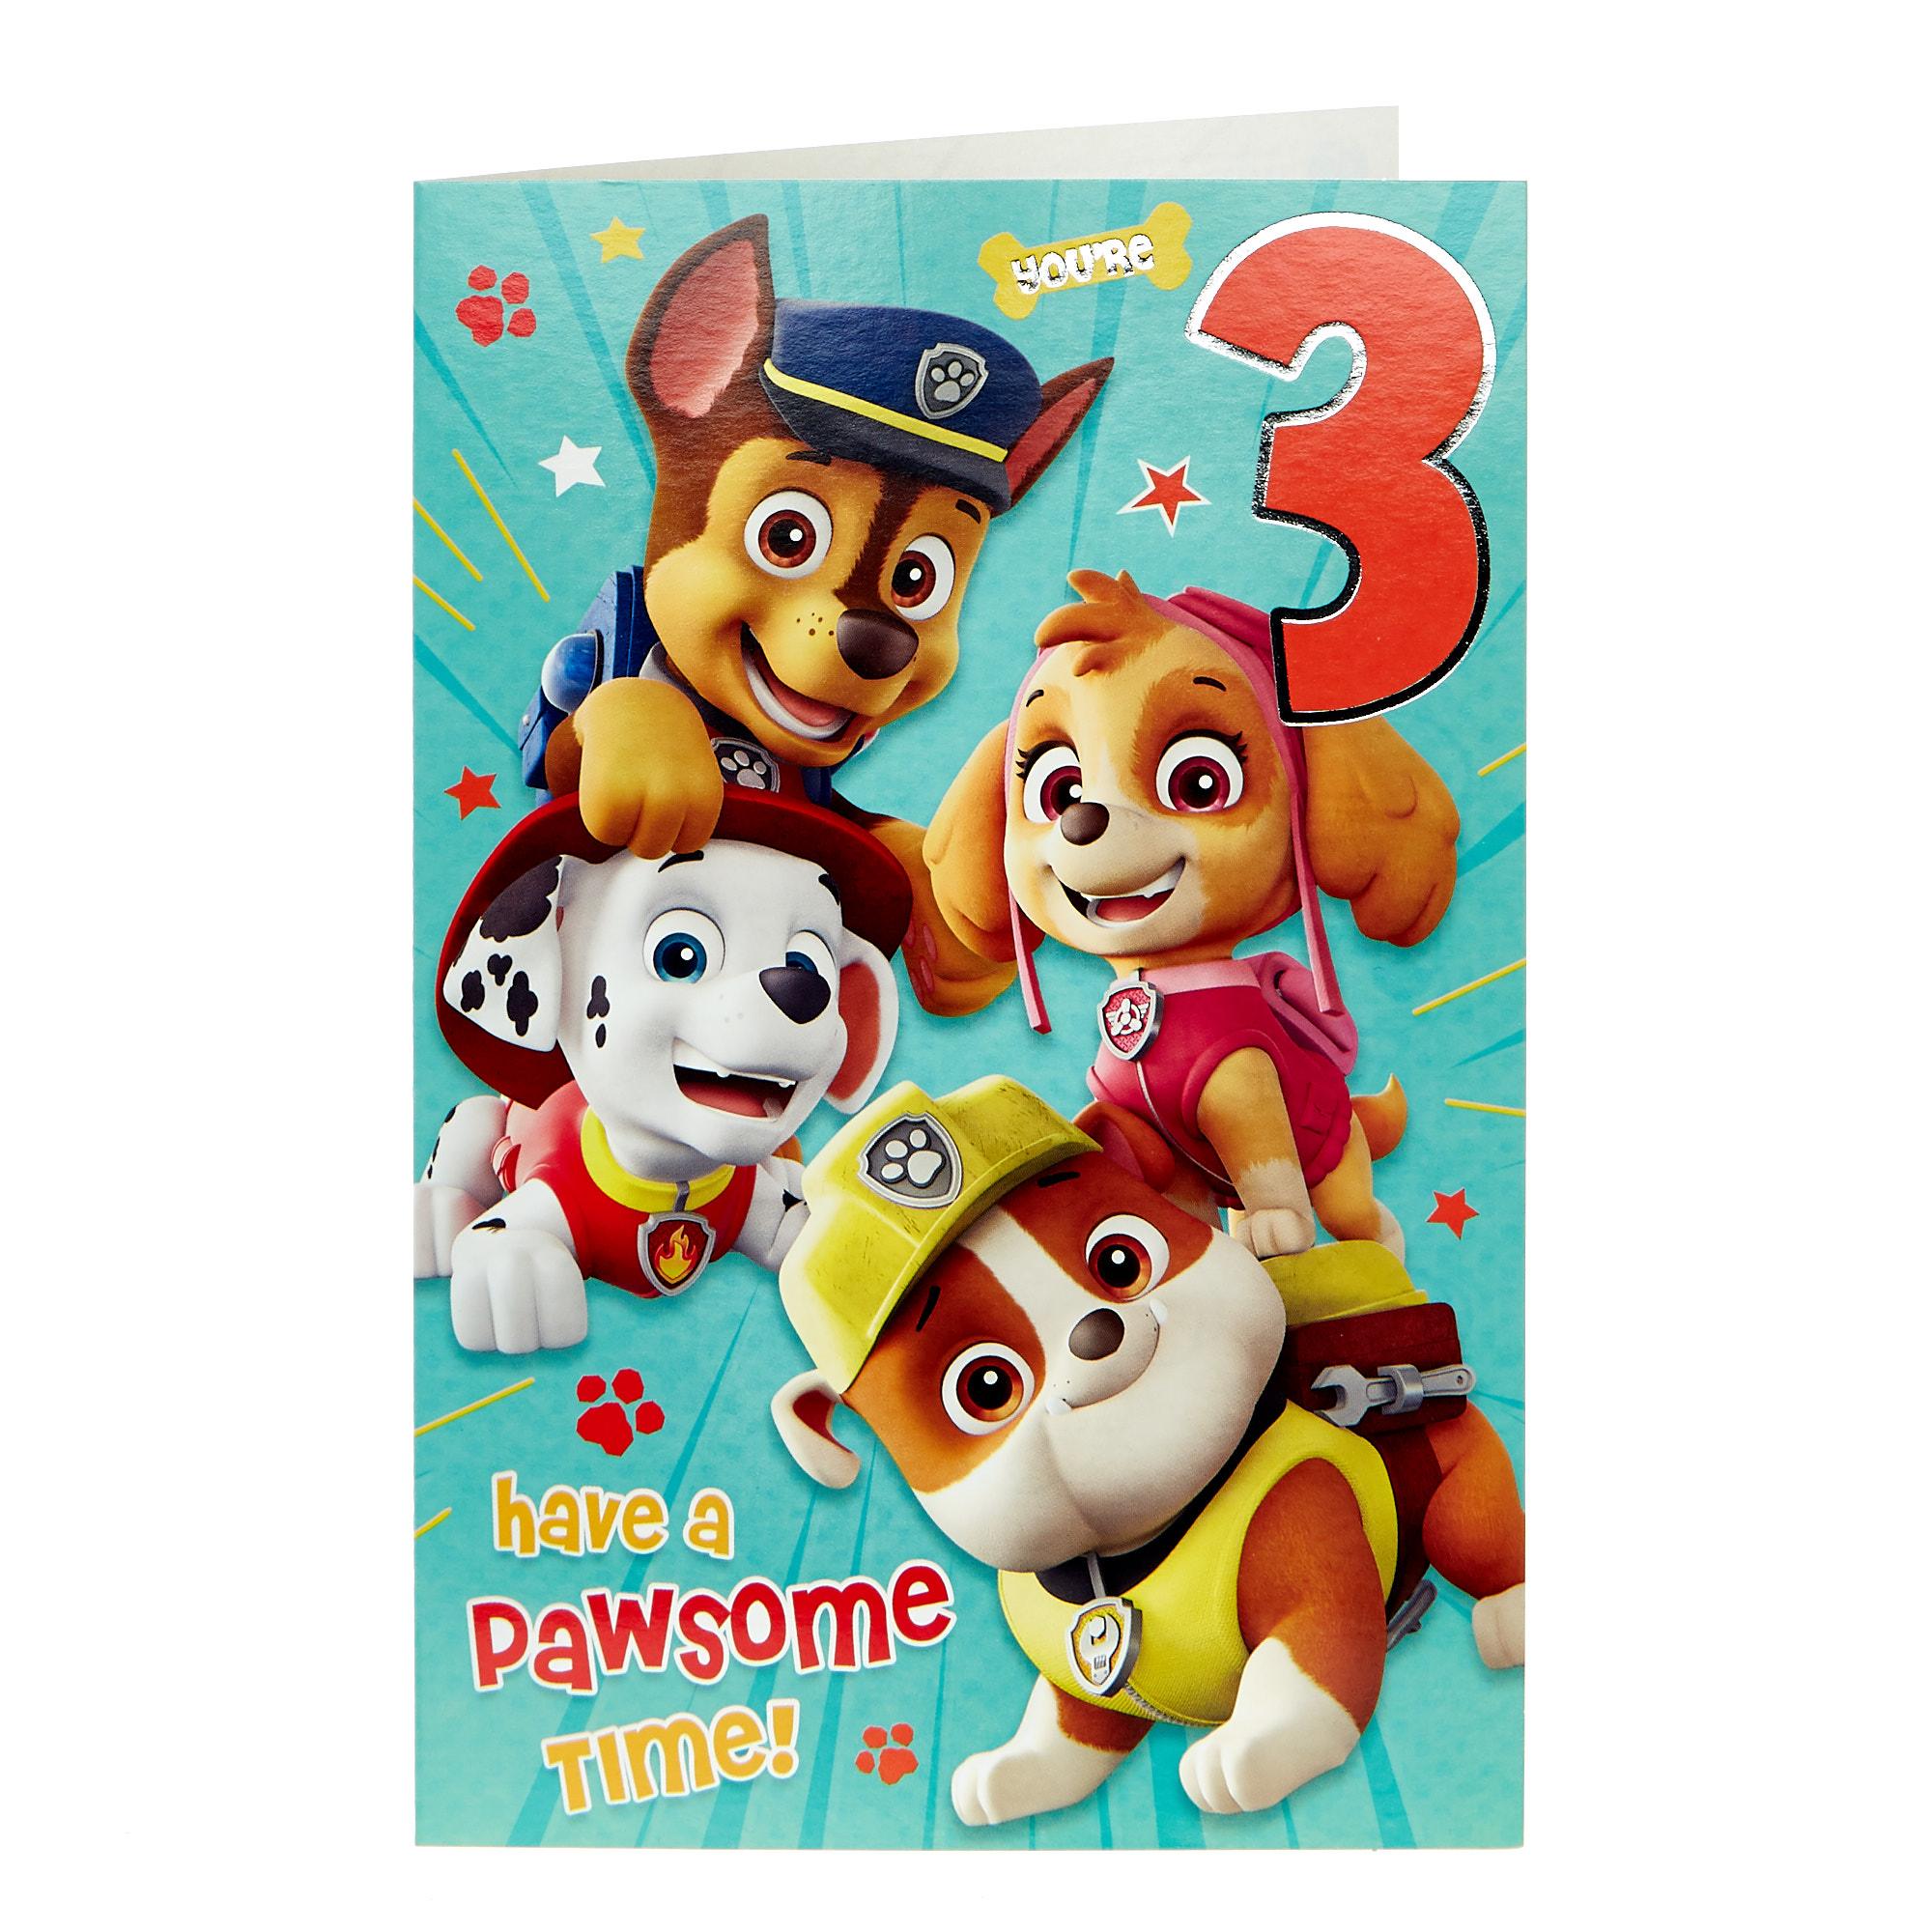 buy paw patrol 3rd birthday card for gbp 099  card